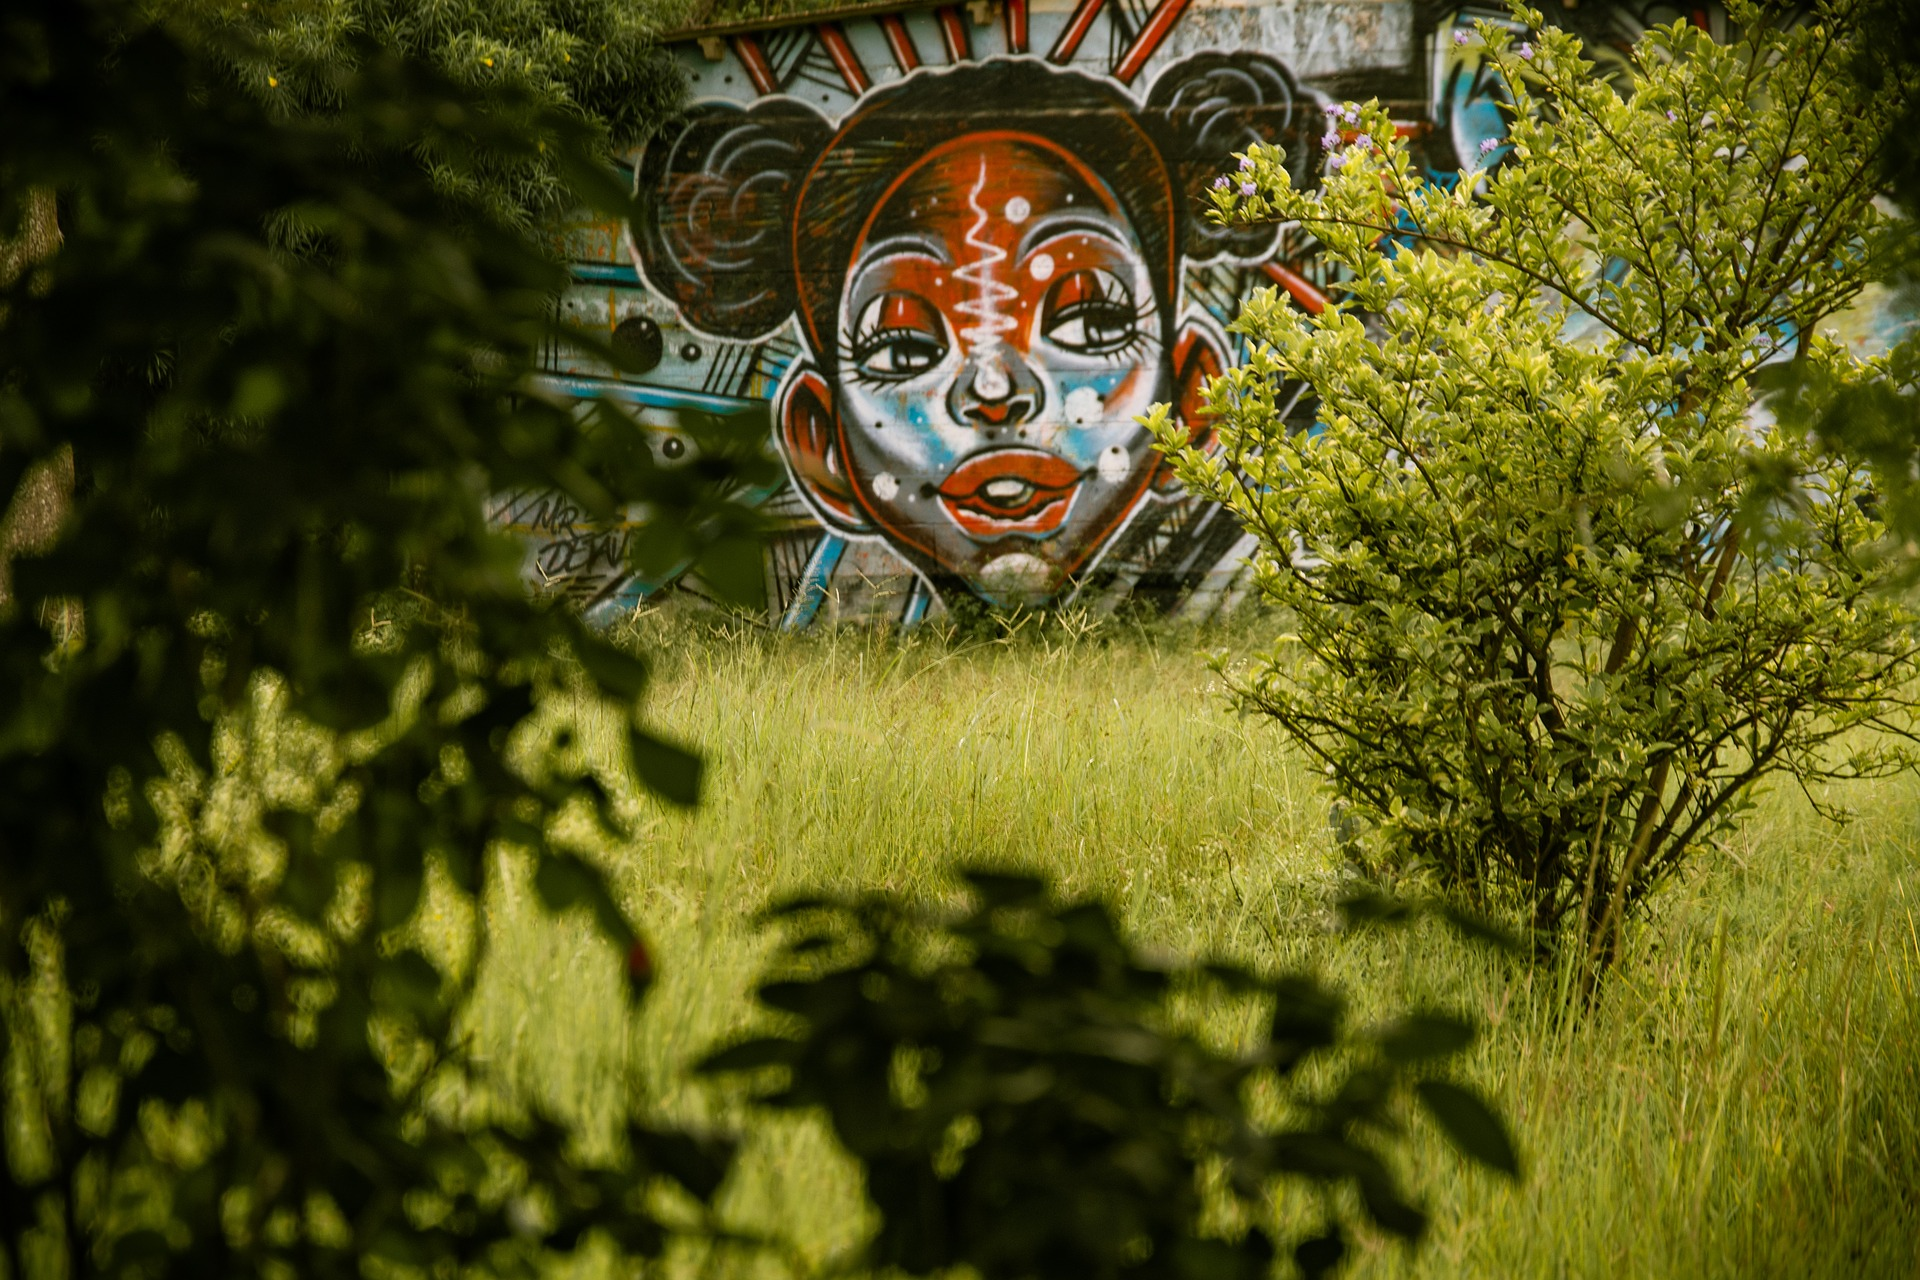 Young people in Nairobi graffiti of a girl